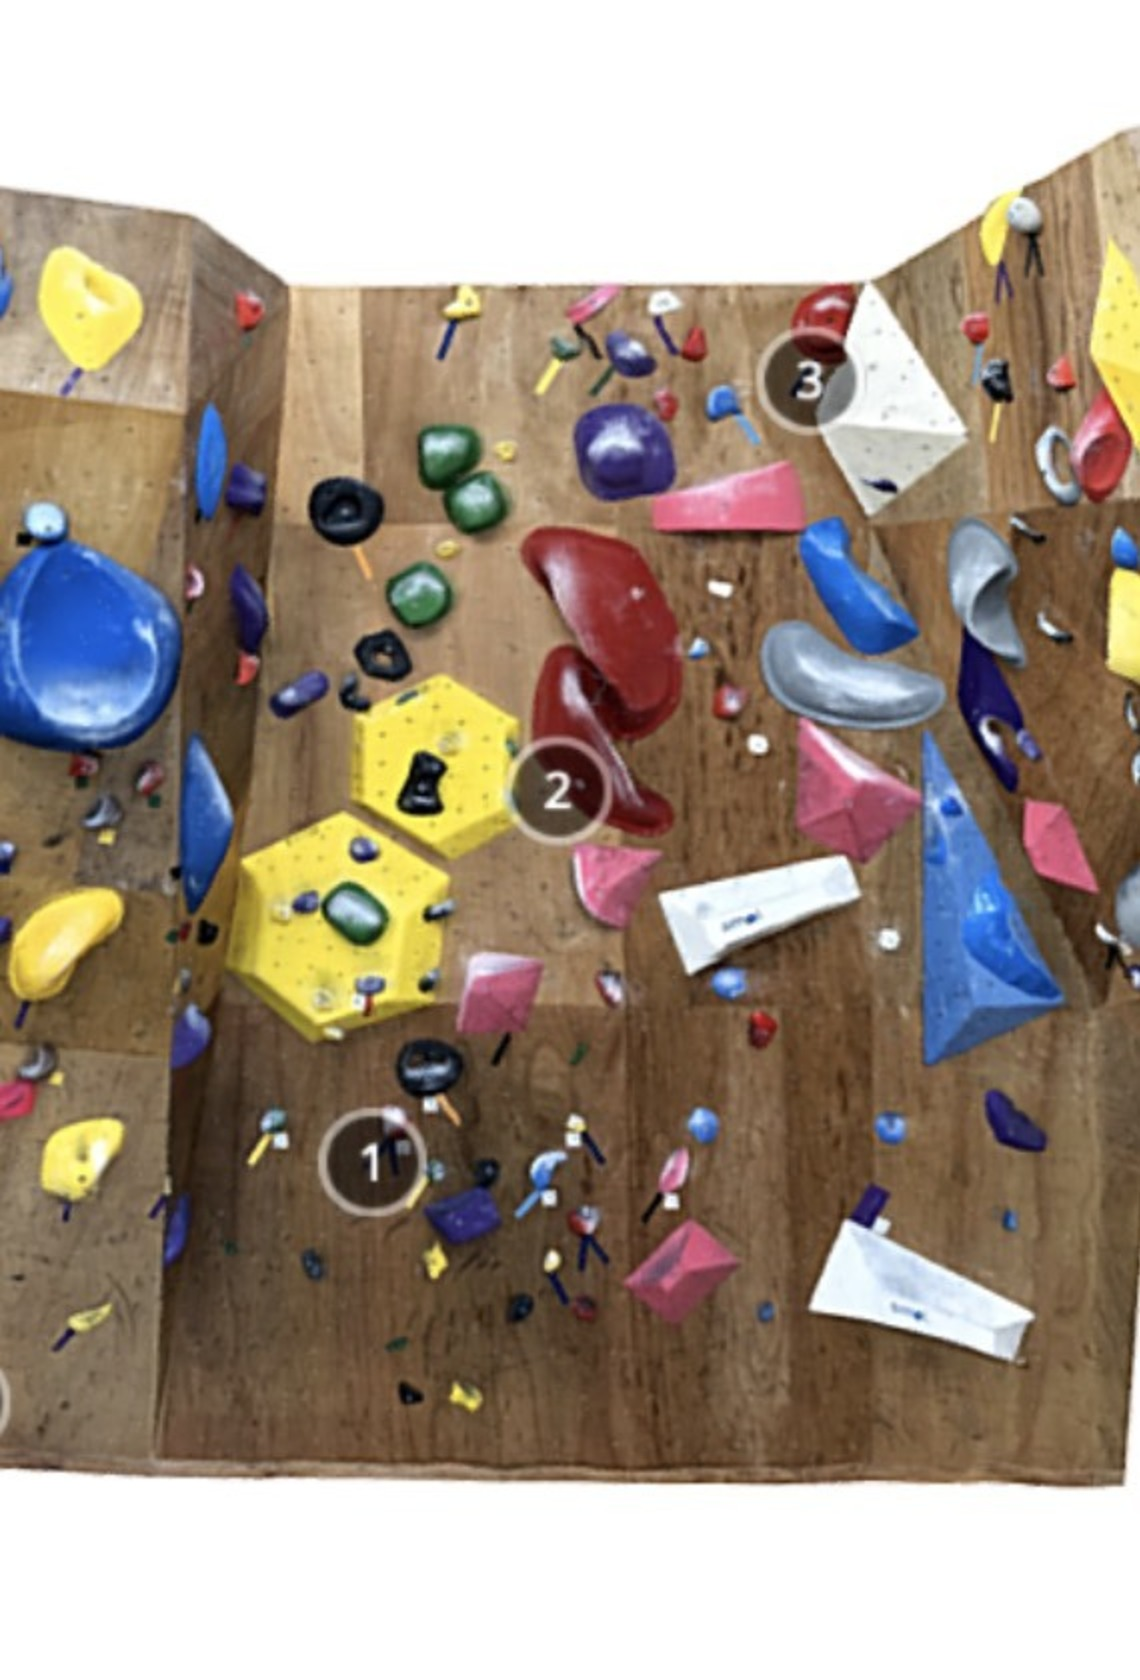 ao_roc.climbing 3Q